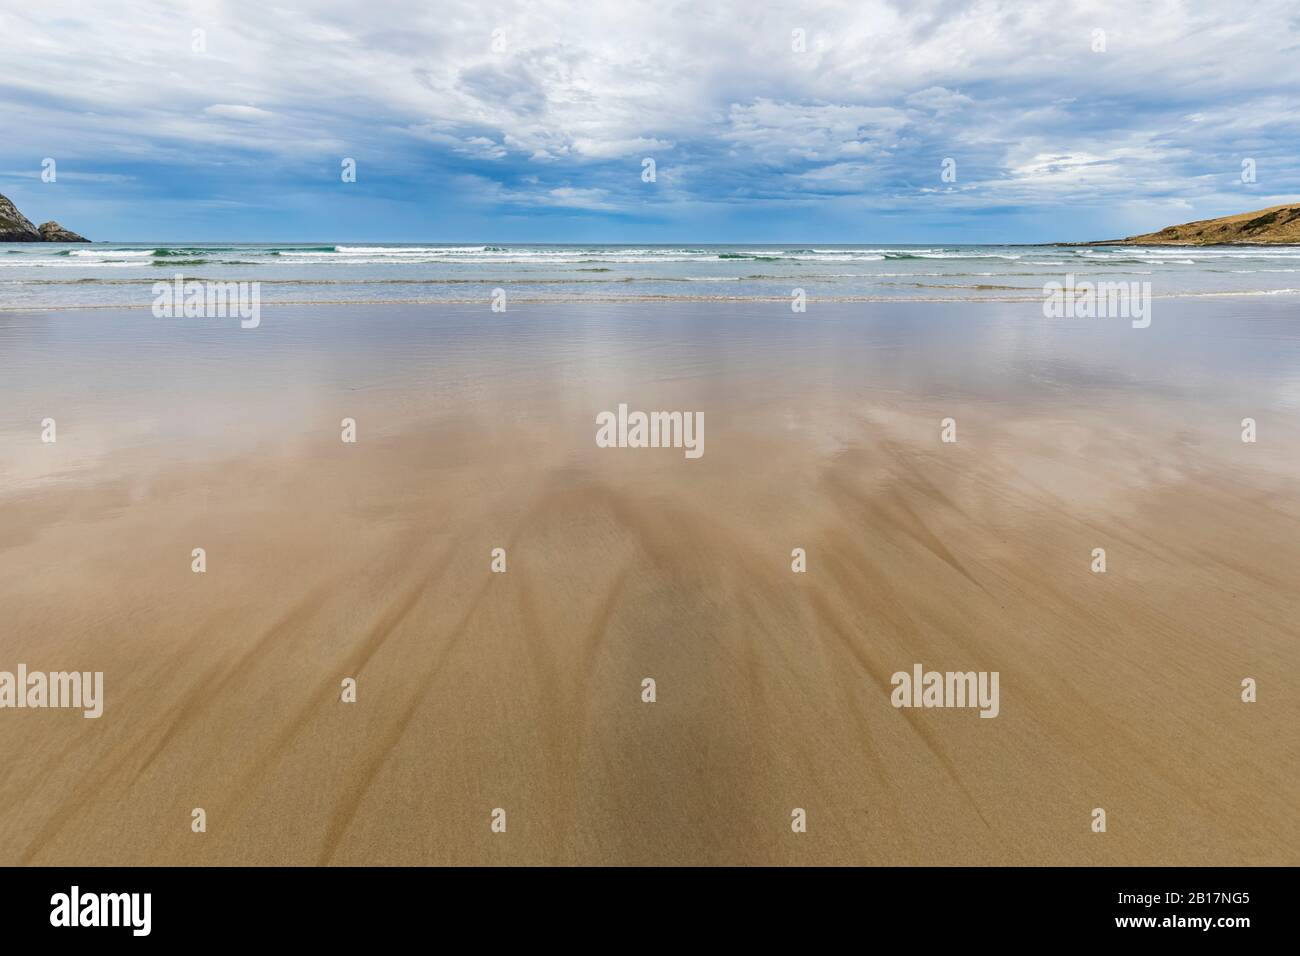 New Zealand, Cloudy sky over sandy coastal beach ofPurakaunuiBay Stock Photo